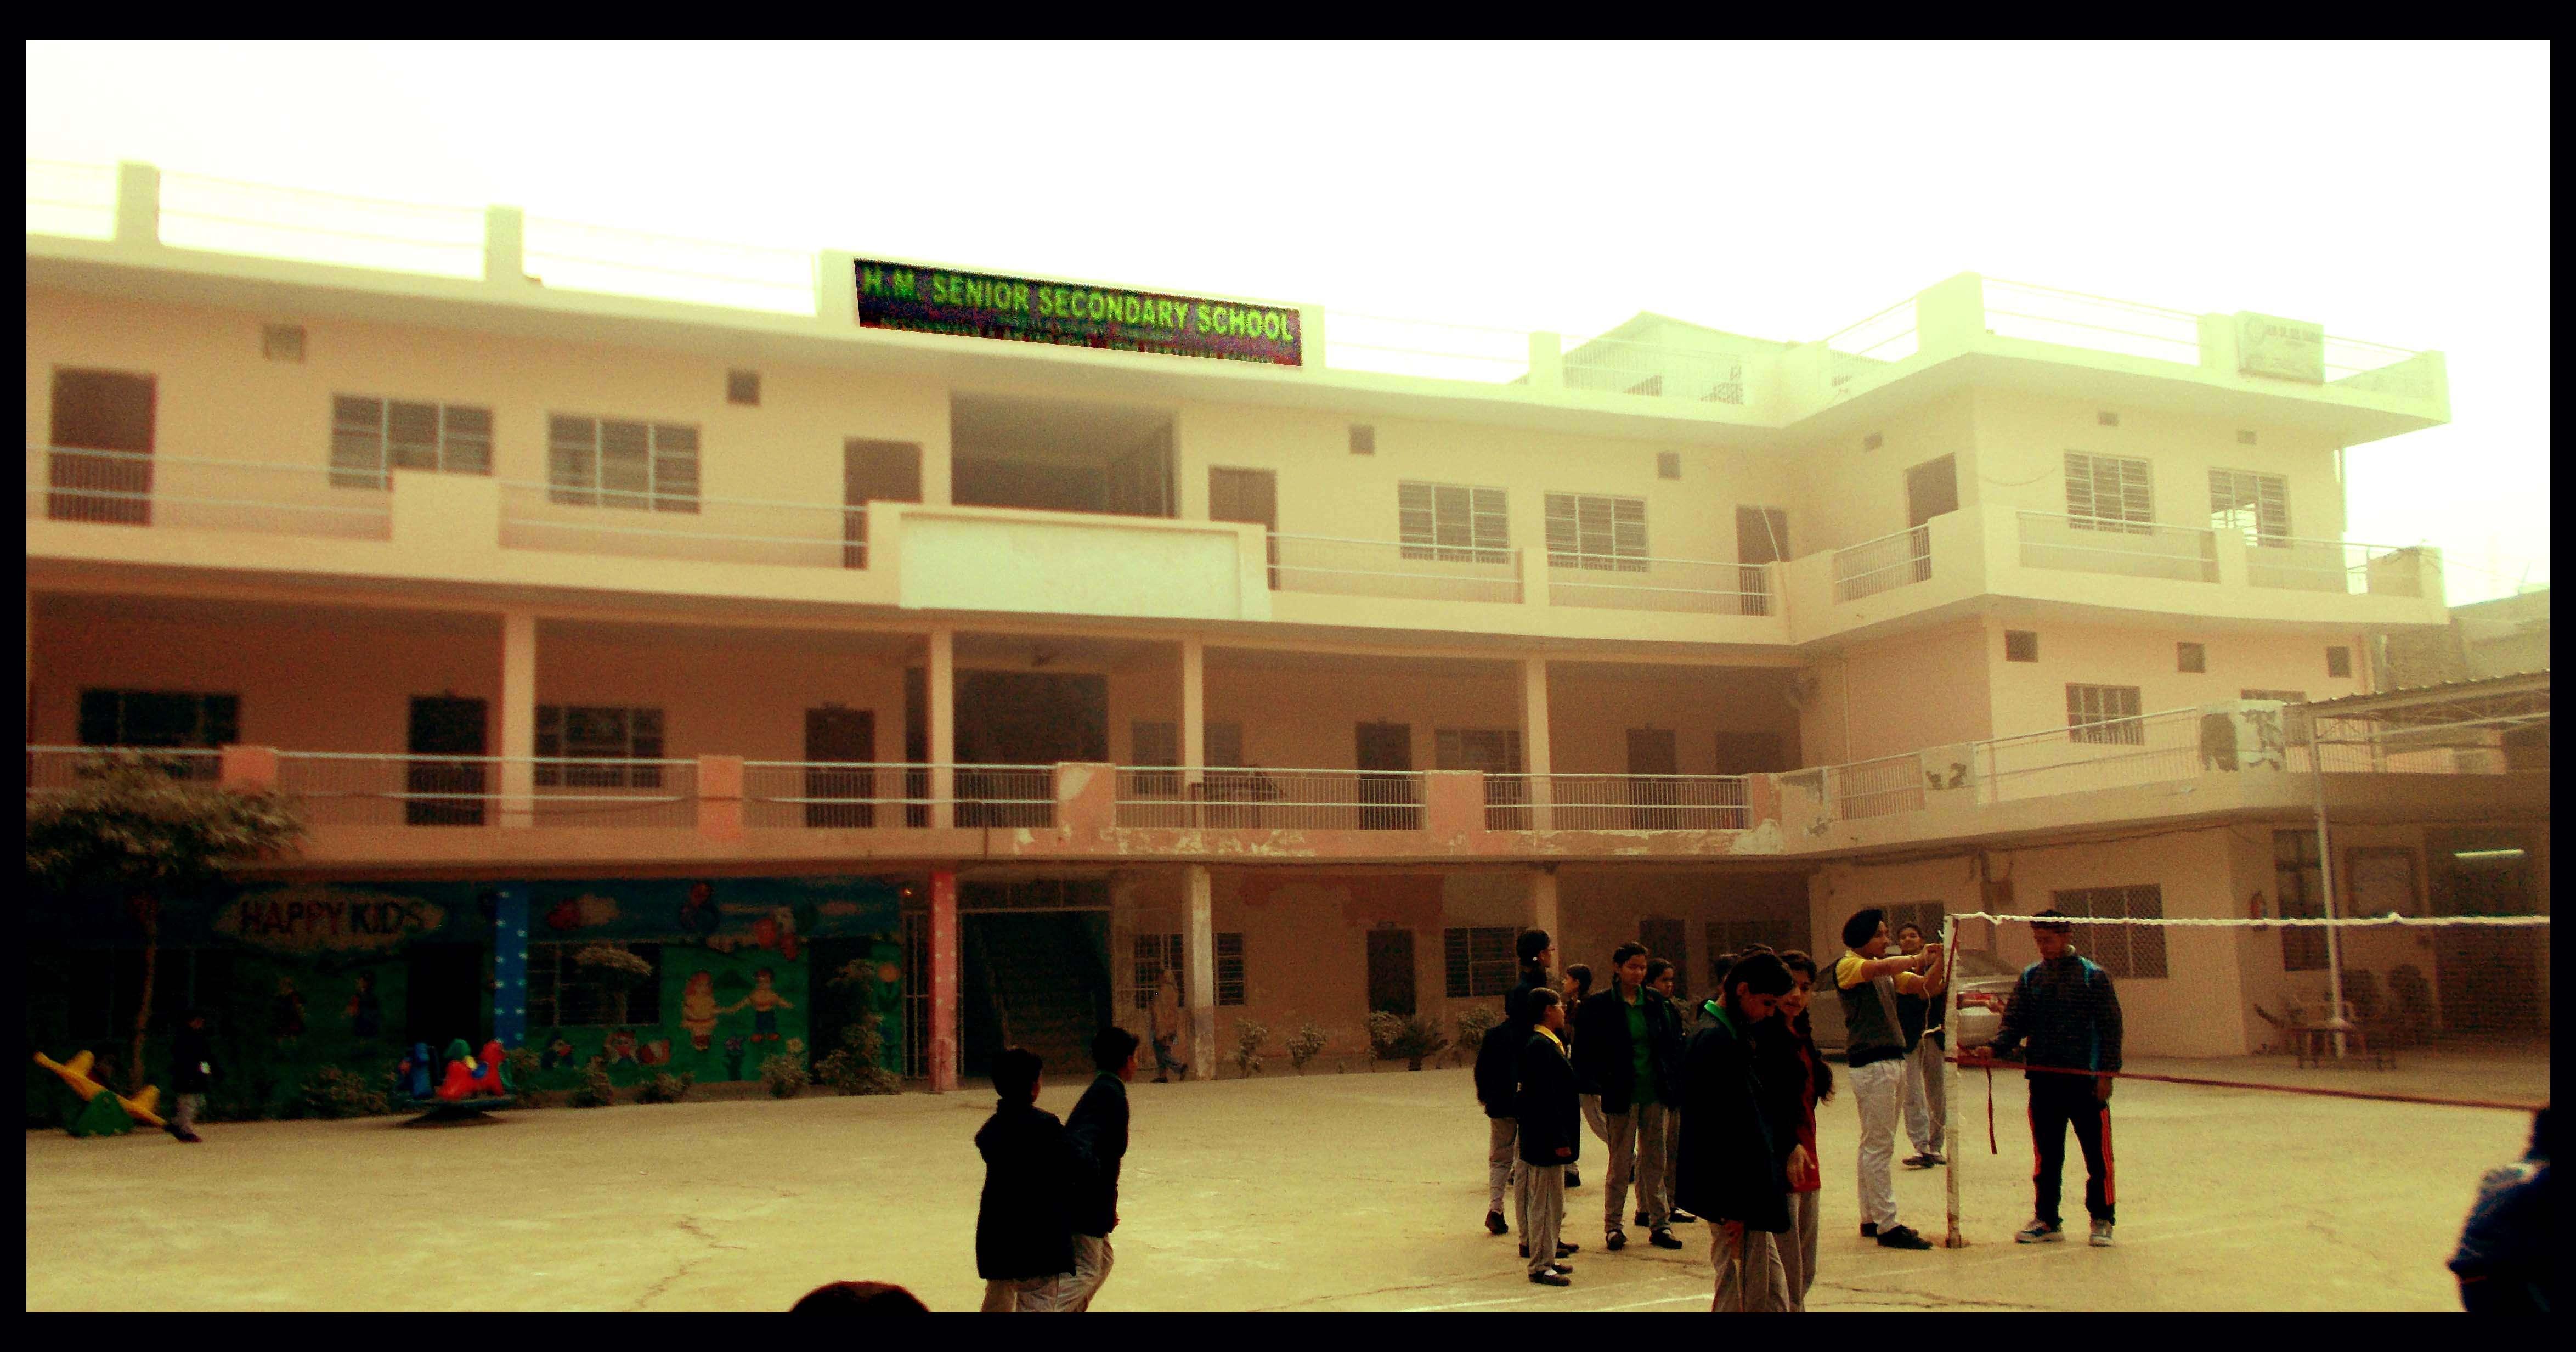 H M SR SEC SCHOOL SHEETLA COLONY 531025